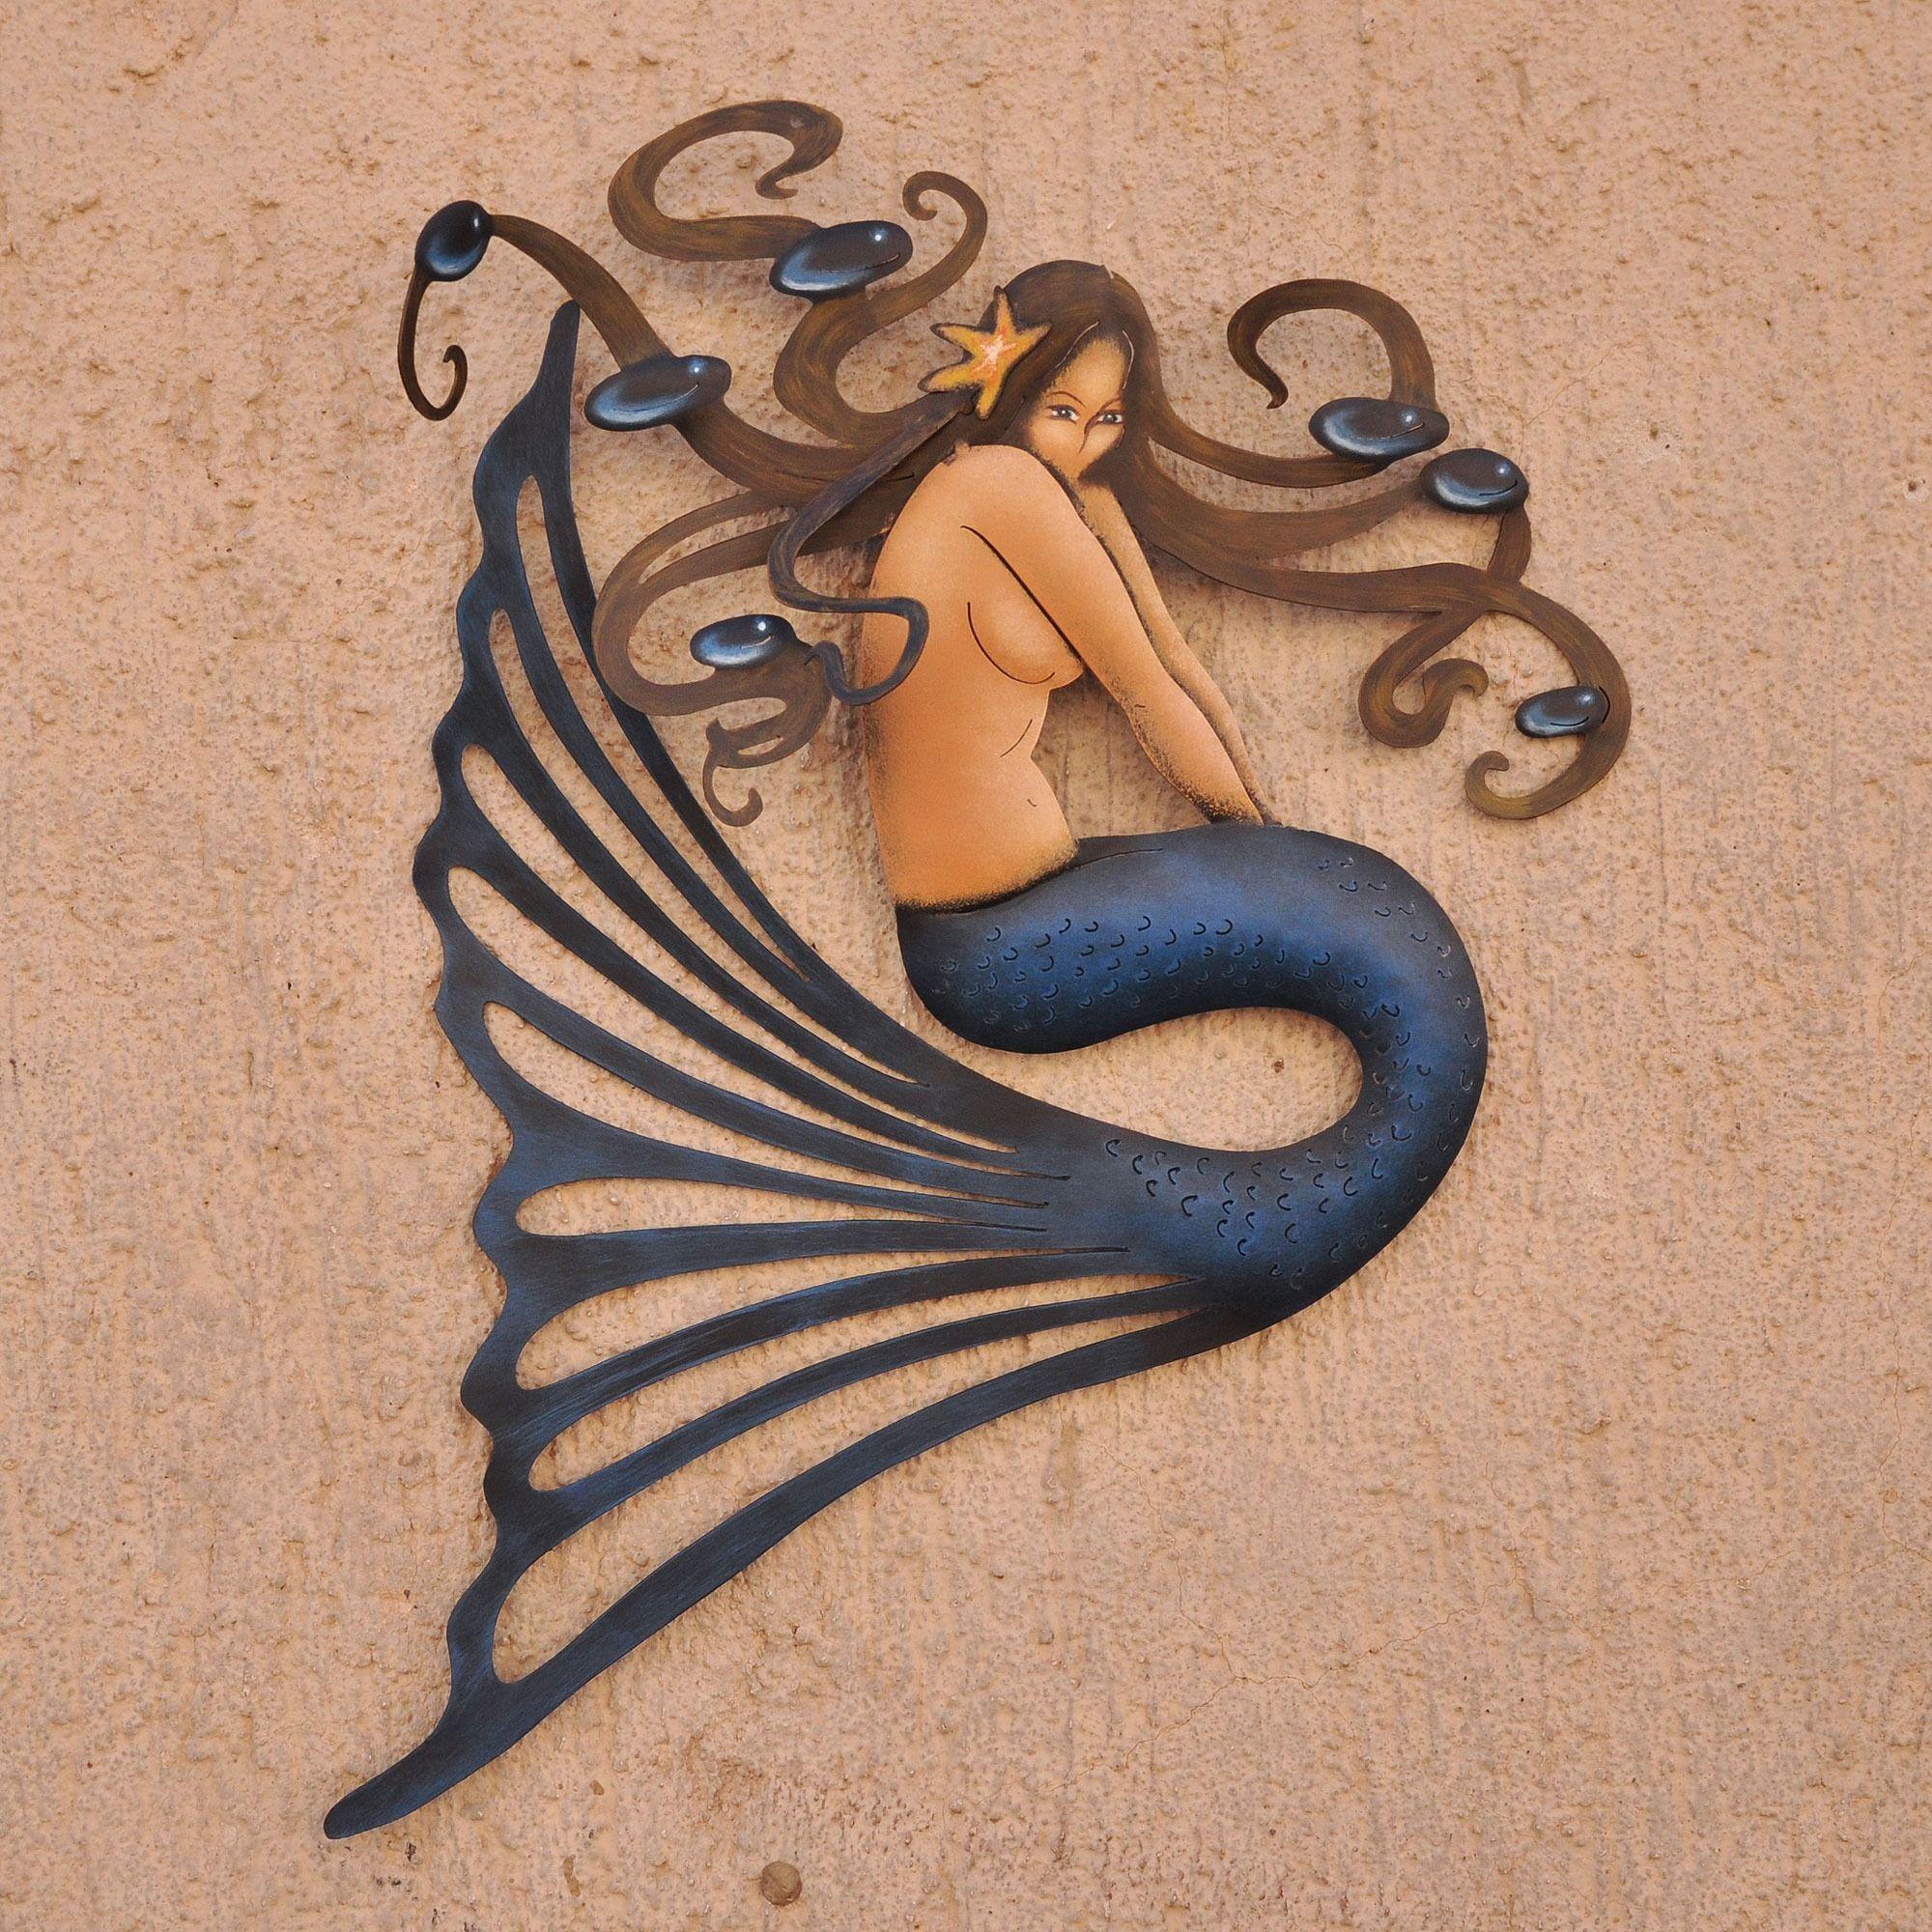 Overstock Com Online Shopping Bedding Furniture Electronics Jewelry Clothing More Mermaid Wall Art Mermaid Art Mermaid